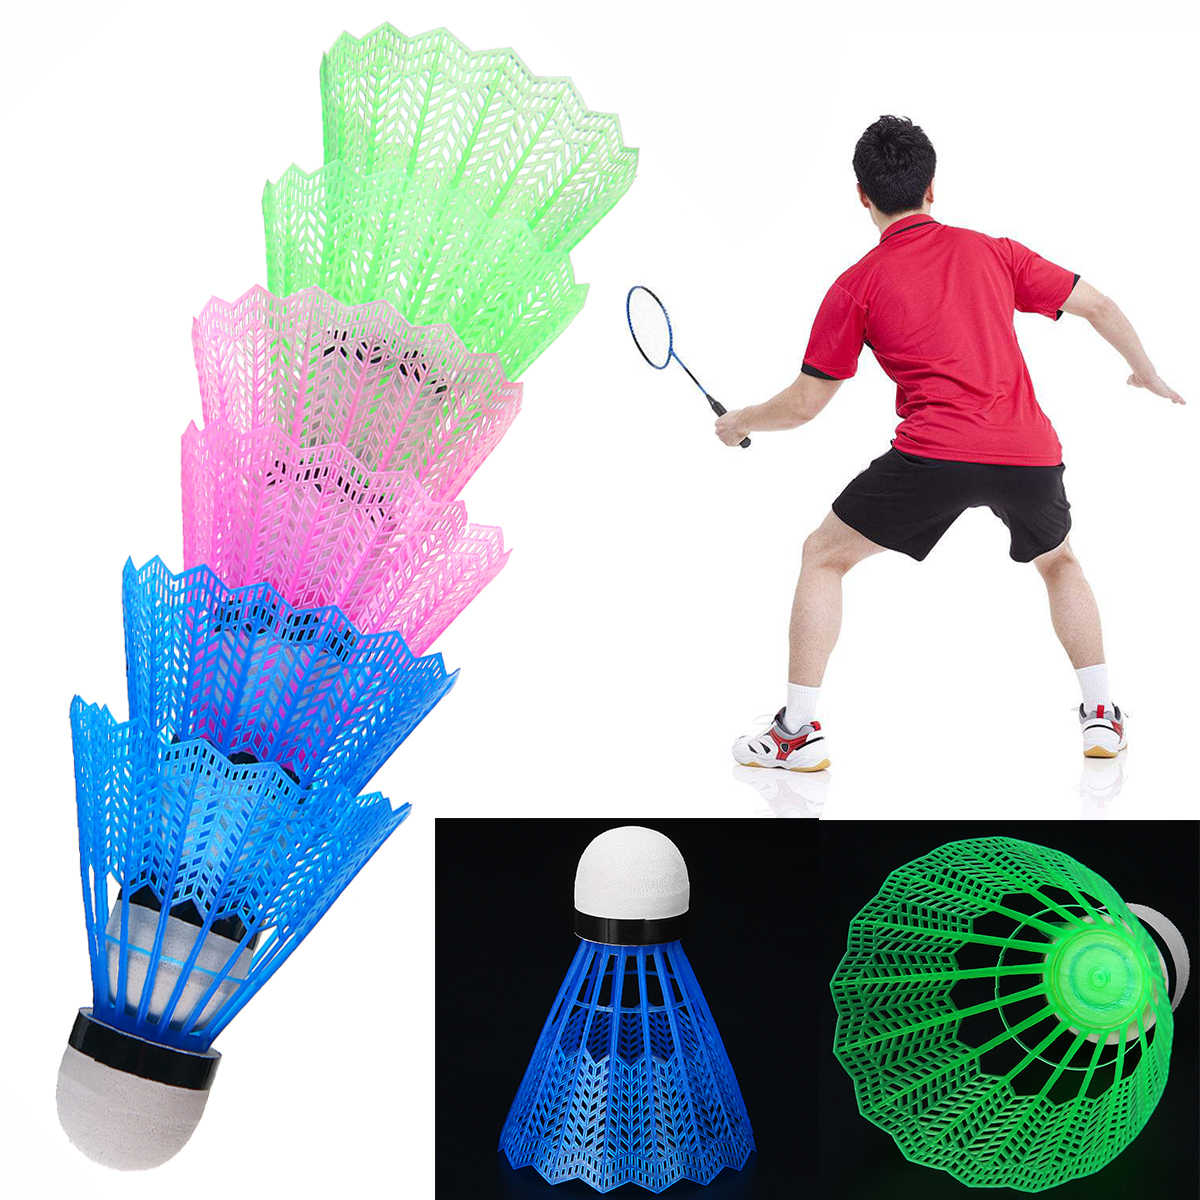 6//12Pcs Colorful Shuttlecocks Leisure Balls Foam Badminton Fitness Games Sport